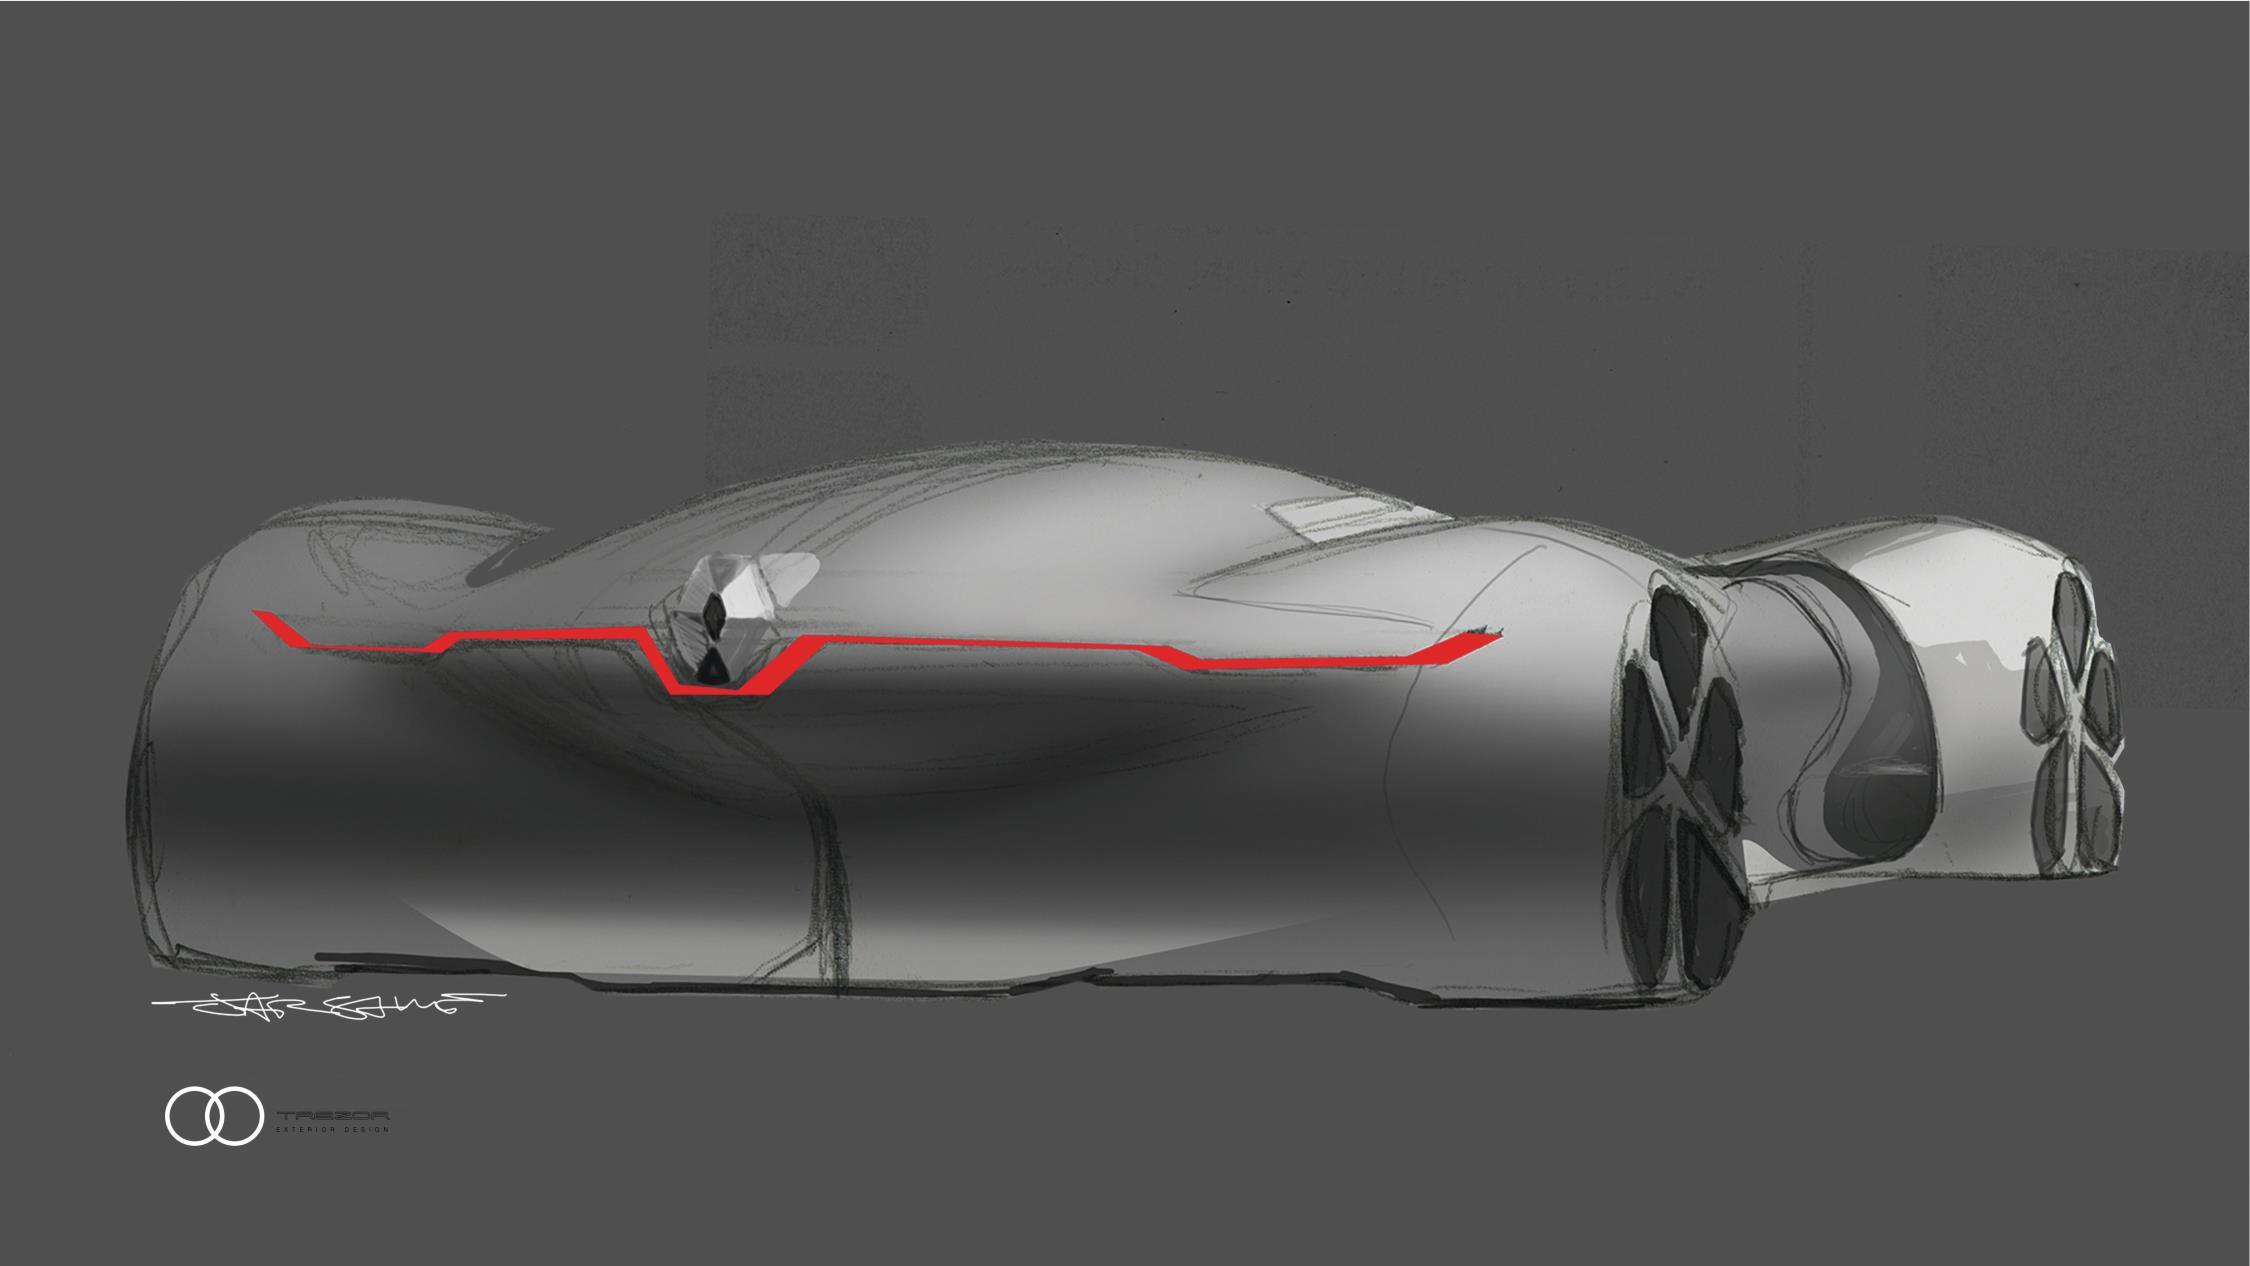 Trezor Concept Design - EMBARGO 08h15 UK Time 290916 (2).JPG